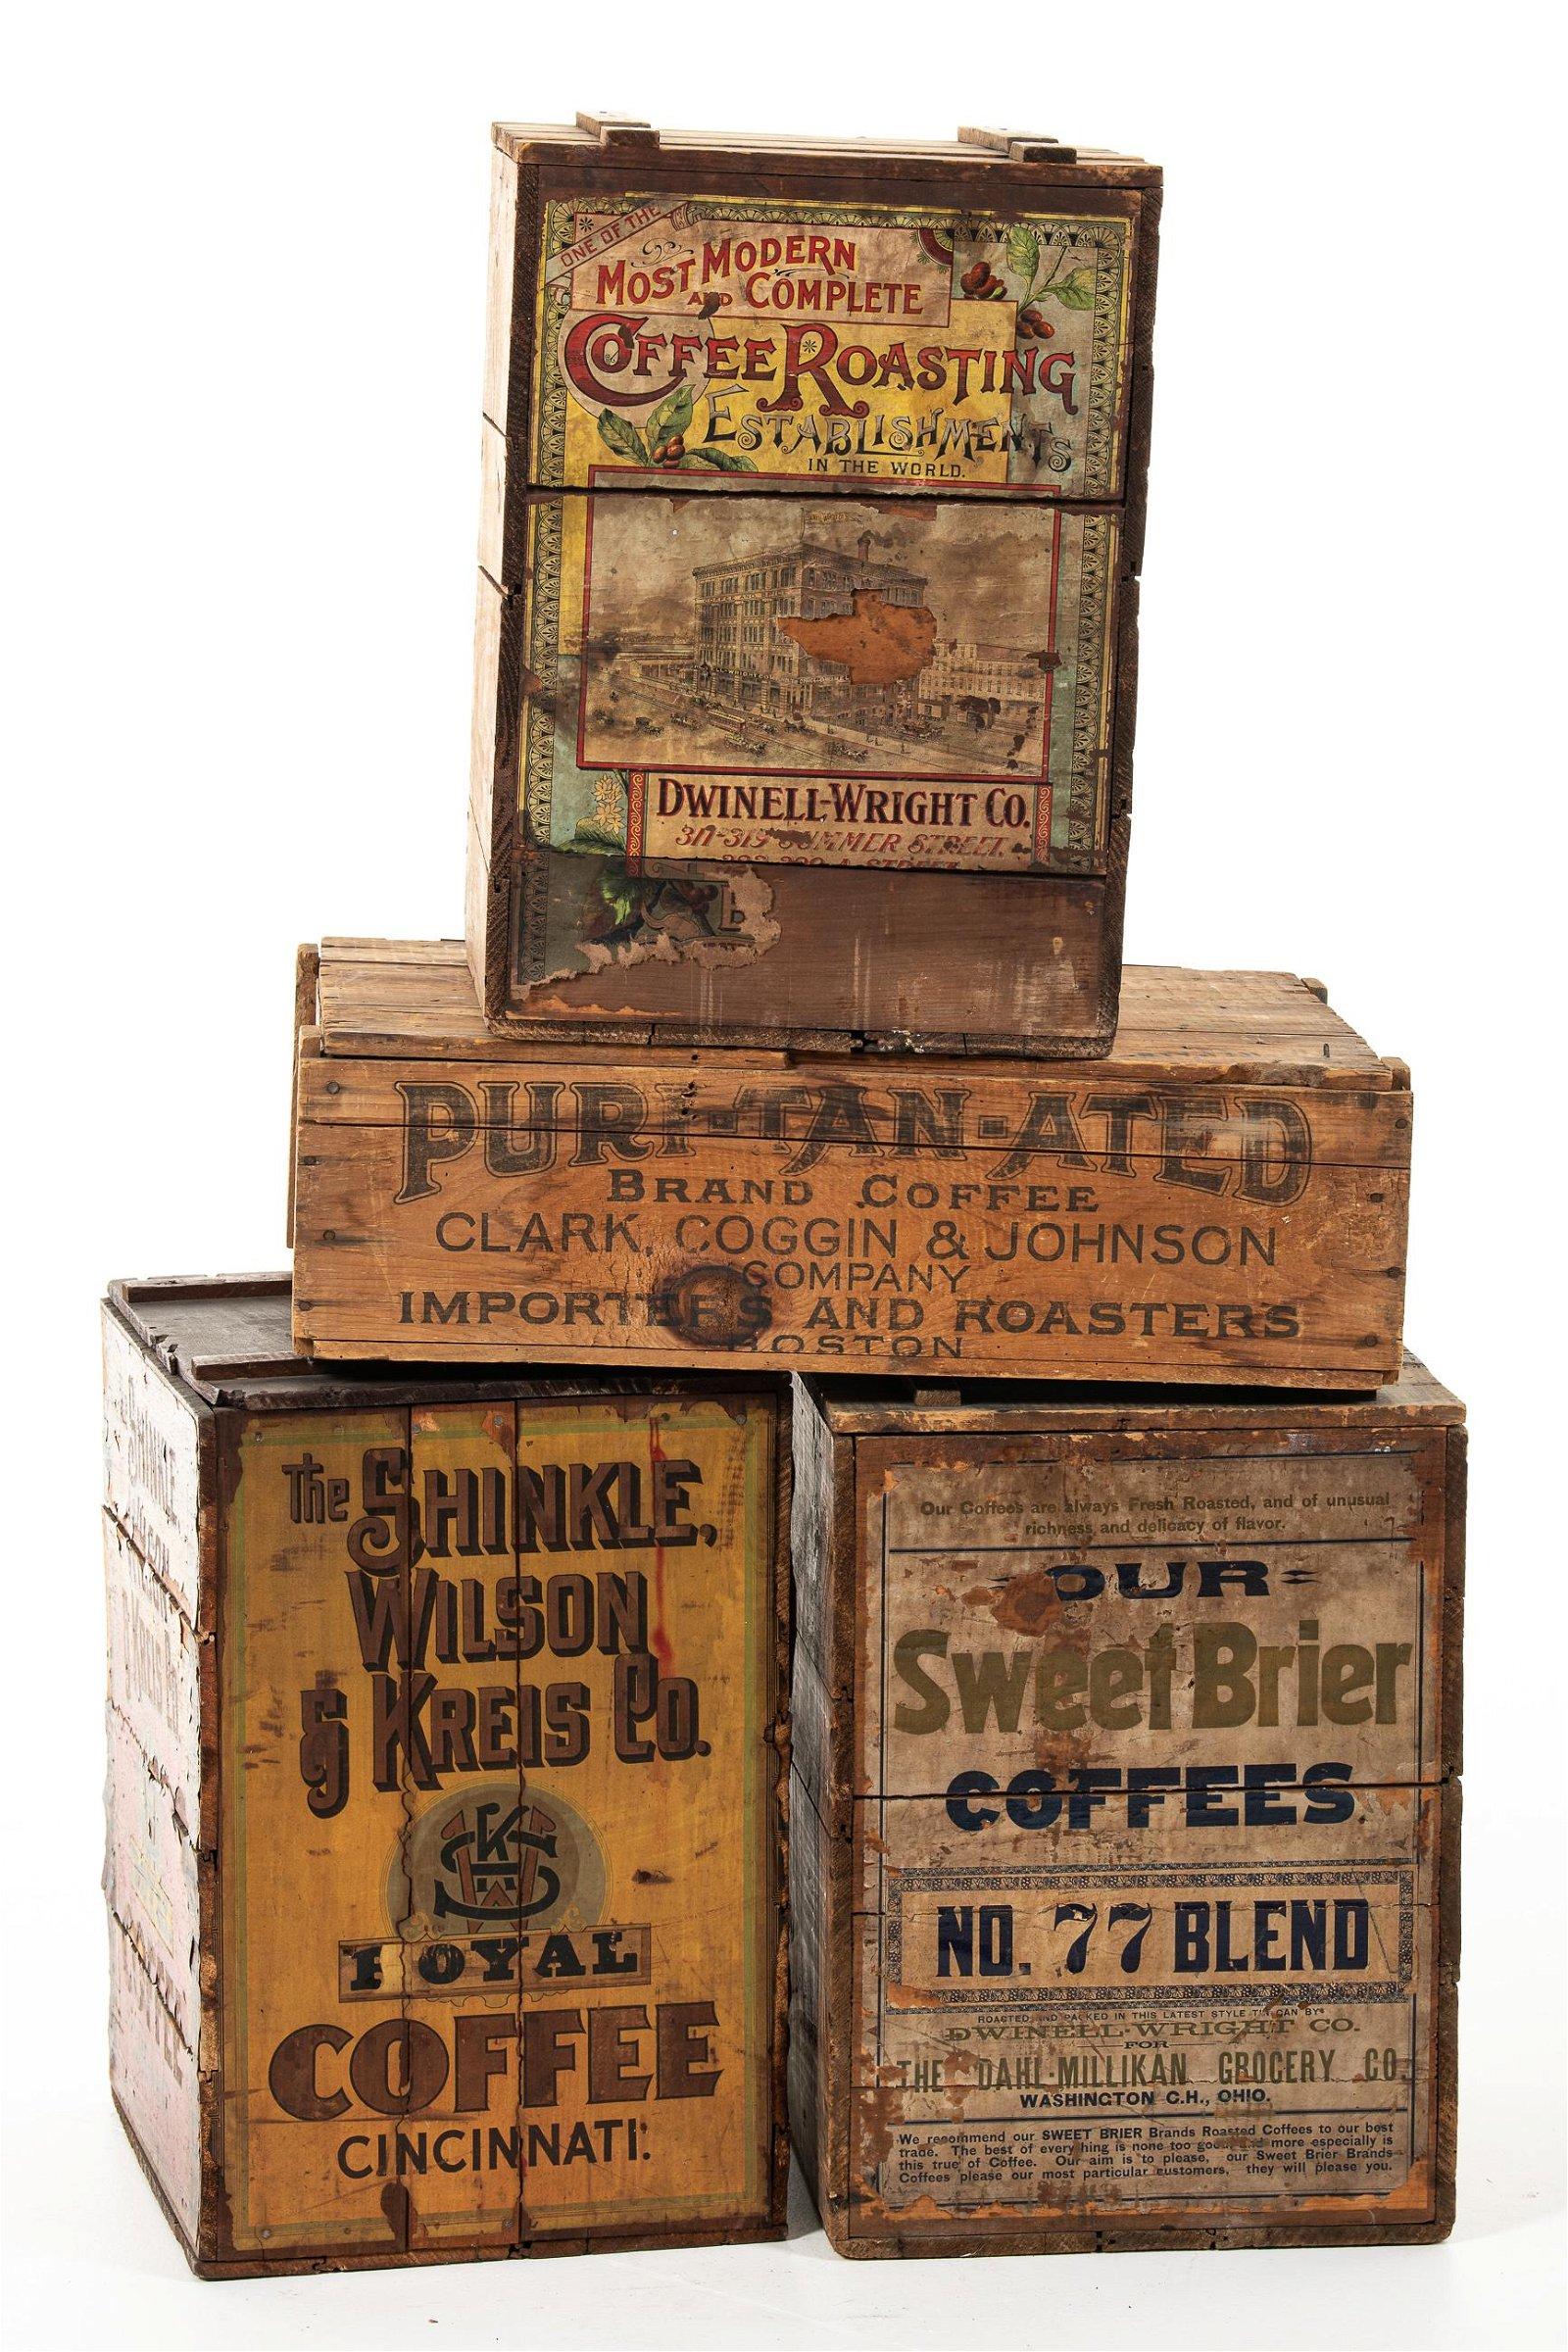 Lot Of 4 Coffee Boxes Royal Puri-Tan-Ated